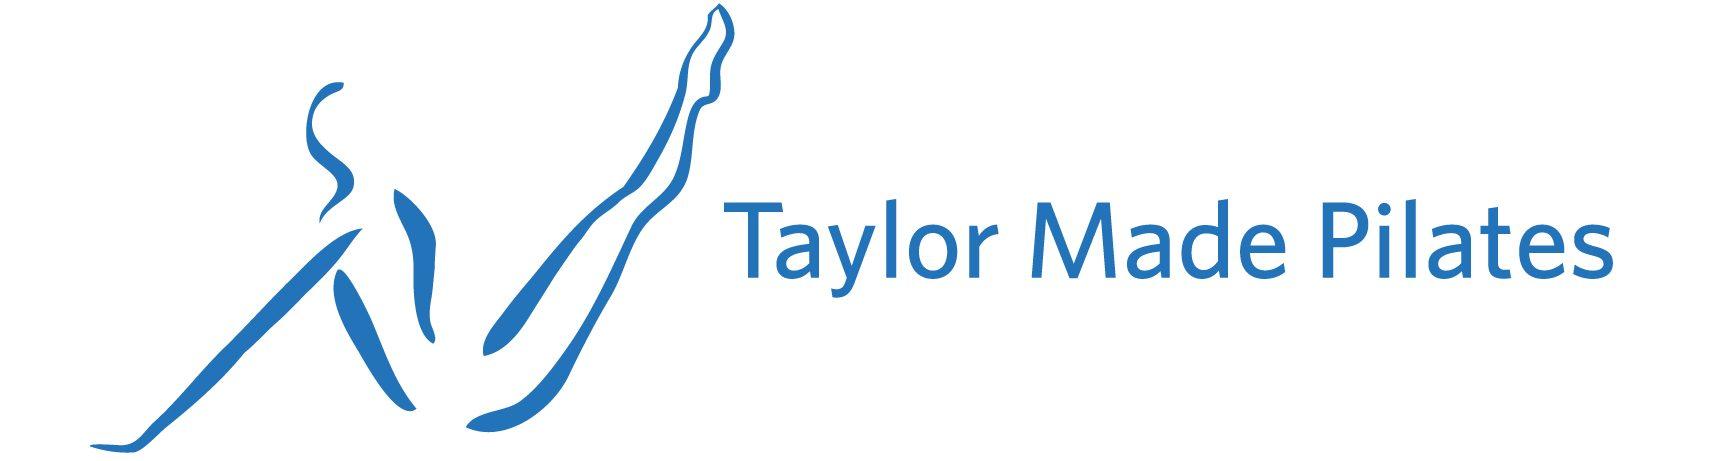 Taylor Made Pilates